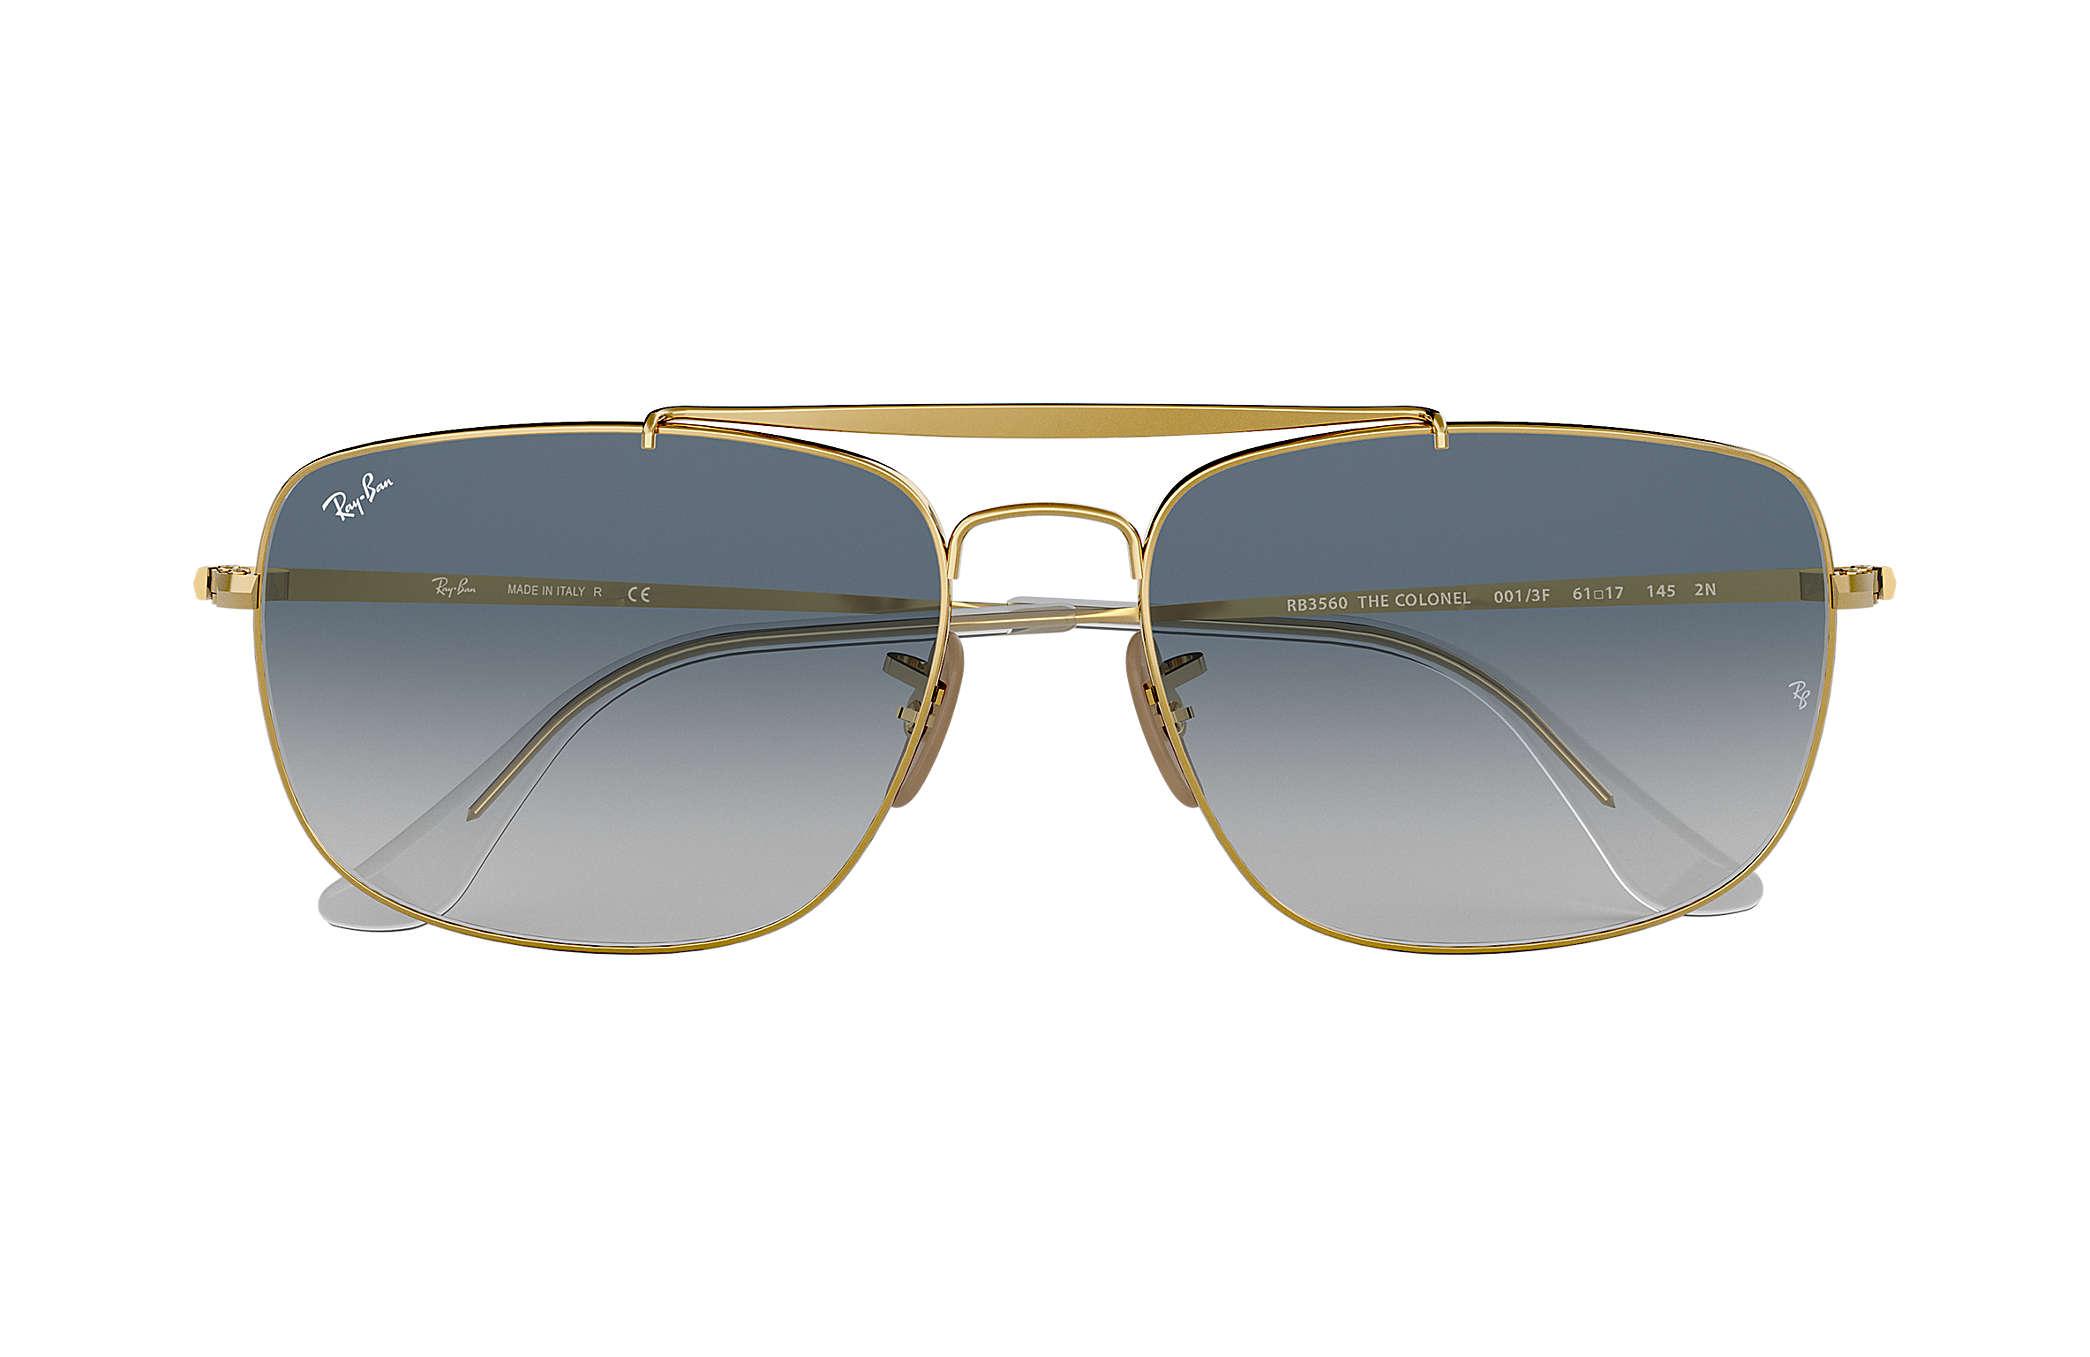 f8cf78ebefa0a Ray-Ban Colonel RB3560 Ouro - Aço - Lentes Azulclaro - 0RB3560001 ...